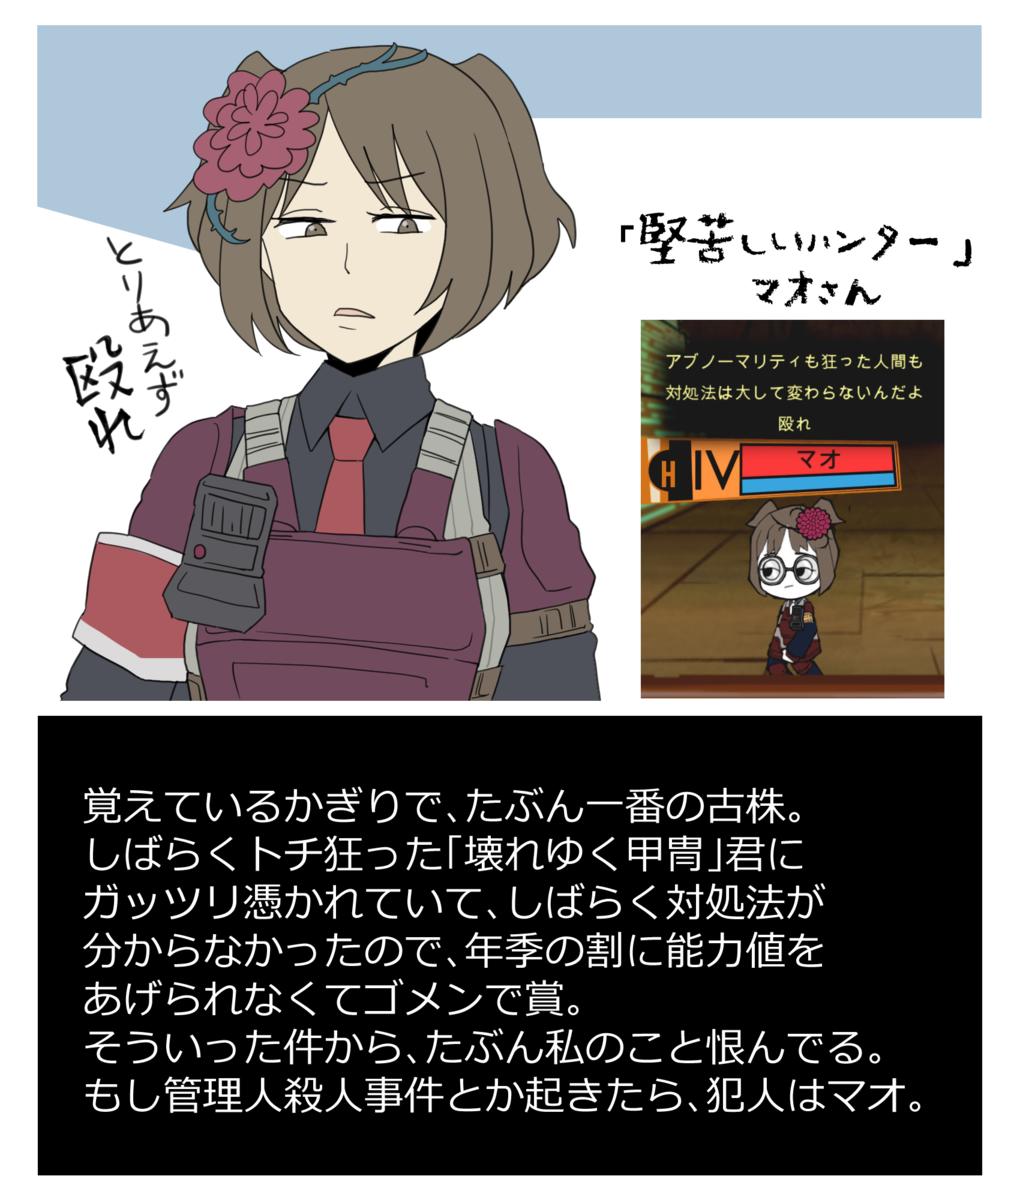 f:id:nantekotodesyoune_segawa:20190515140147p:plain